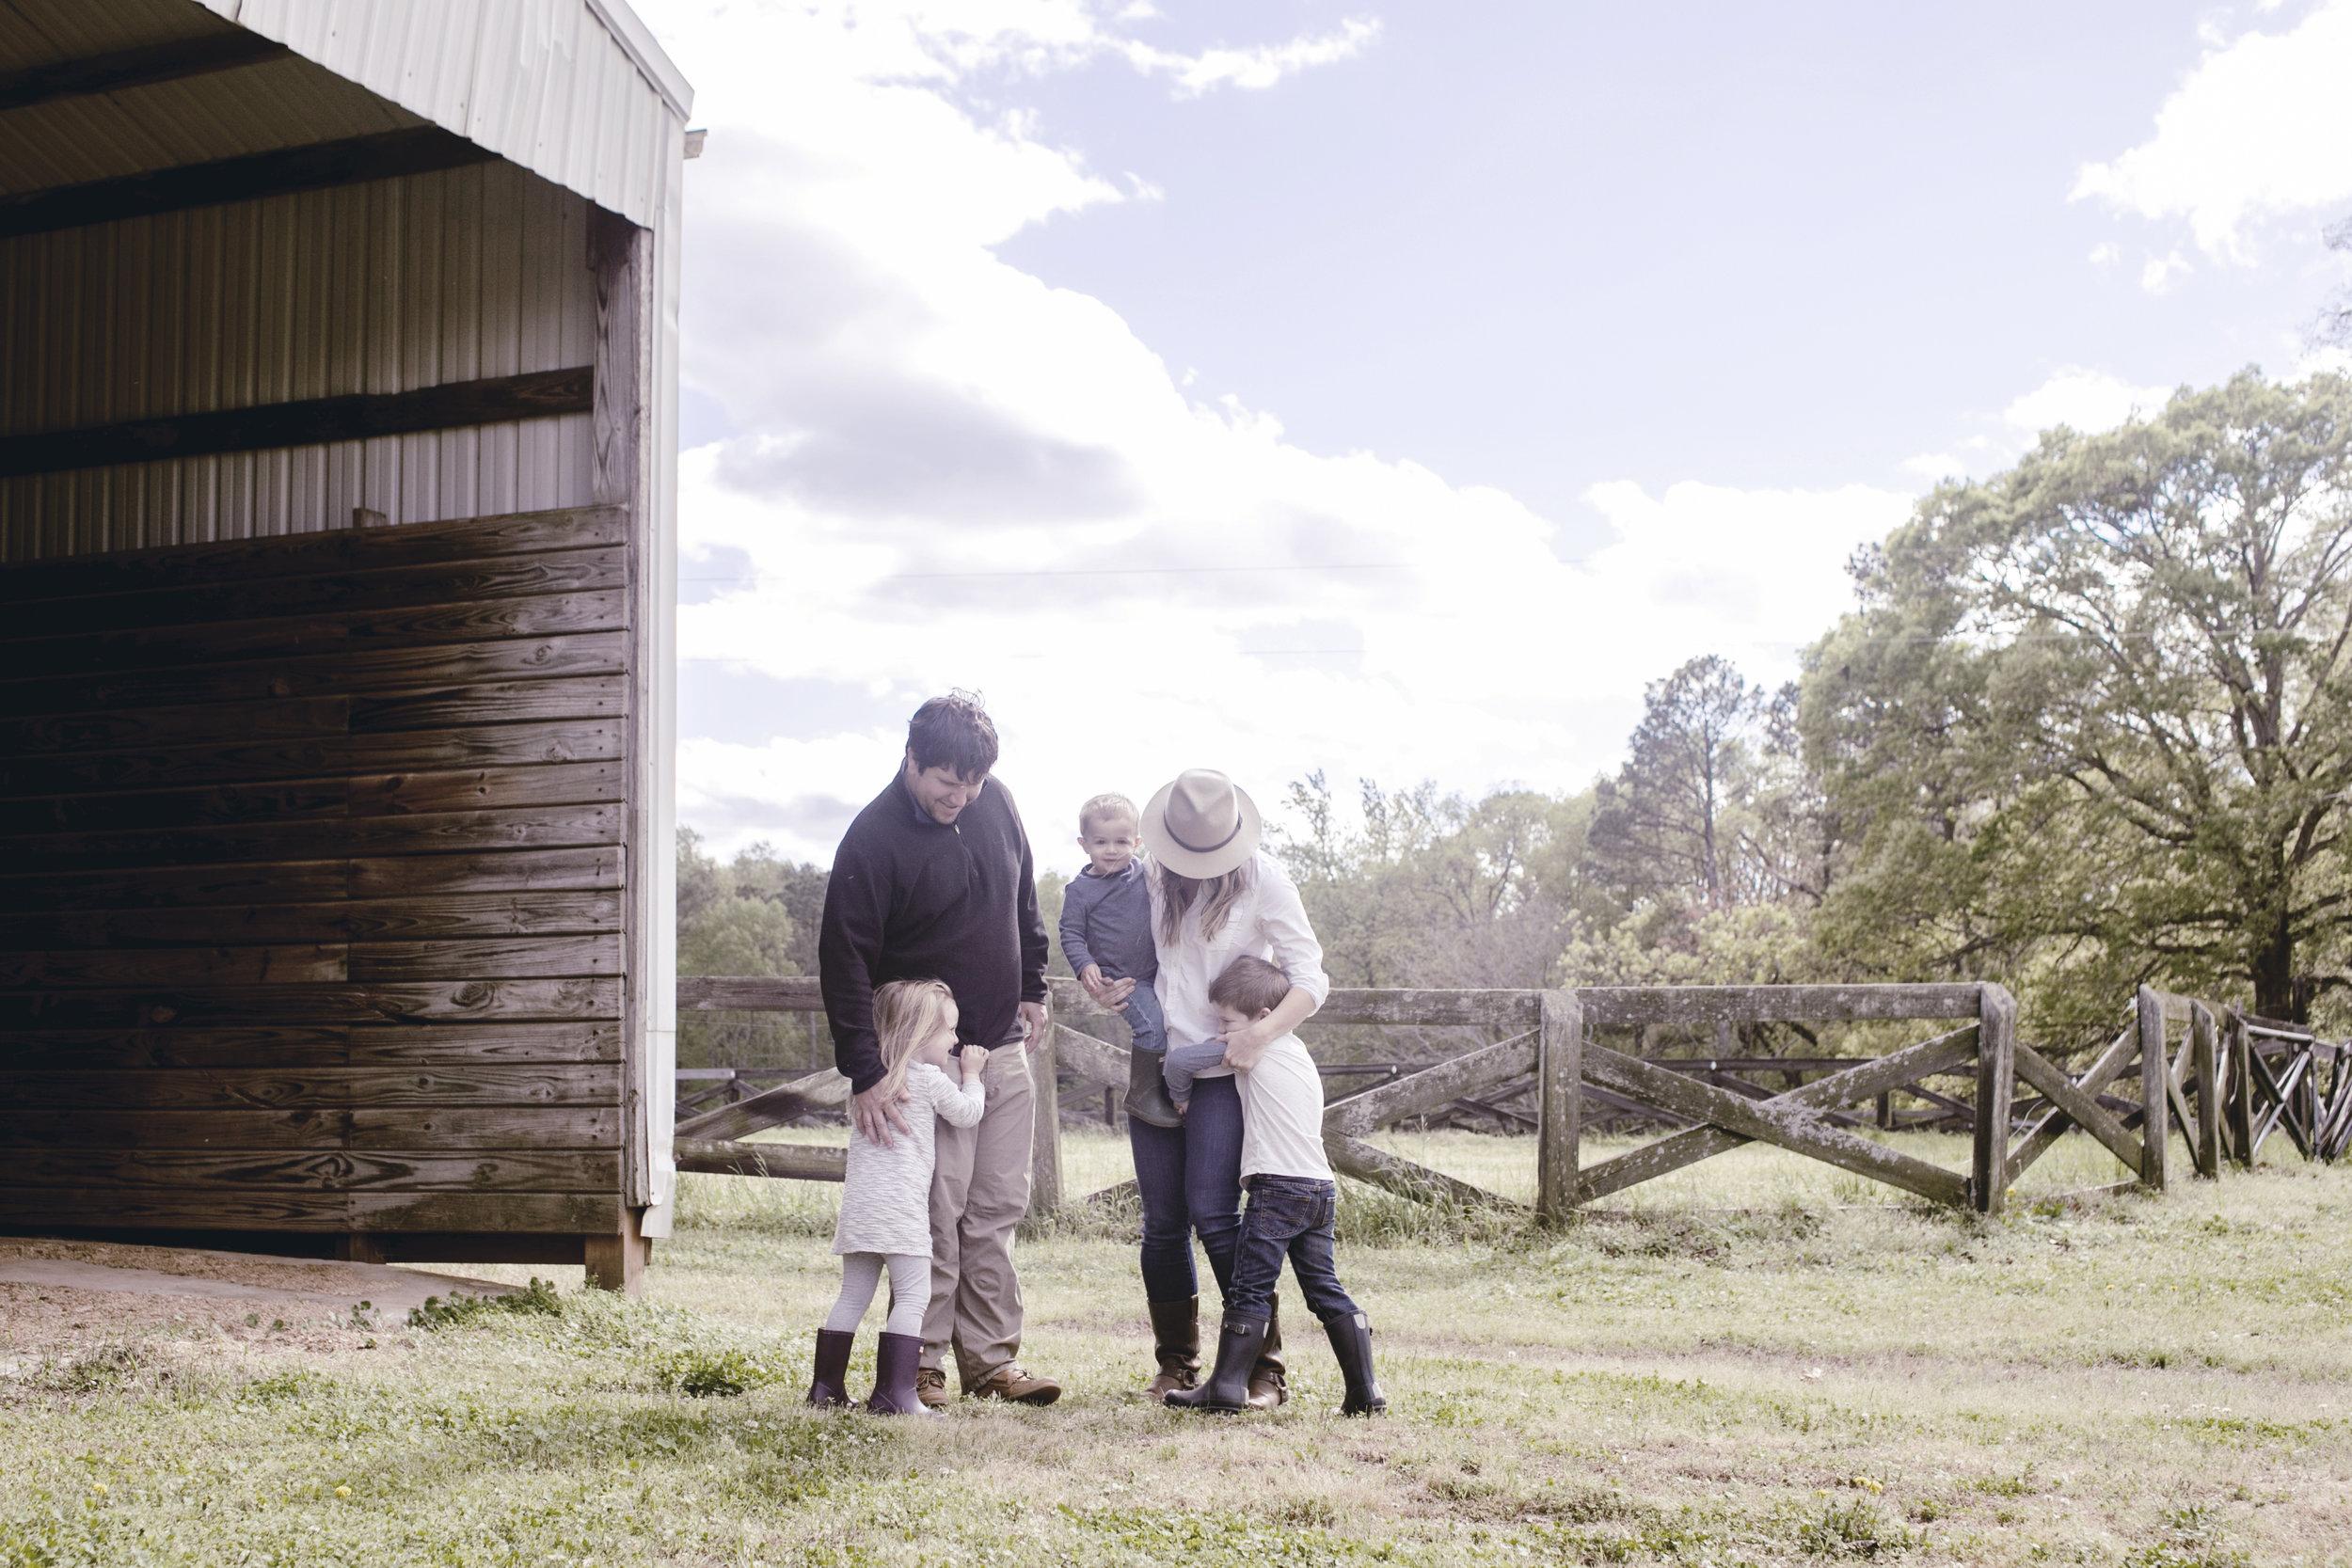 family photo at the farm / heirloomed